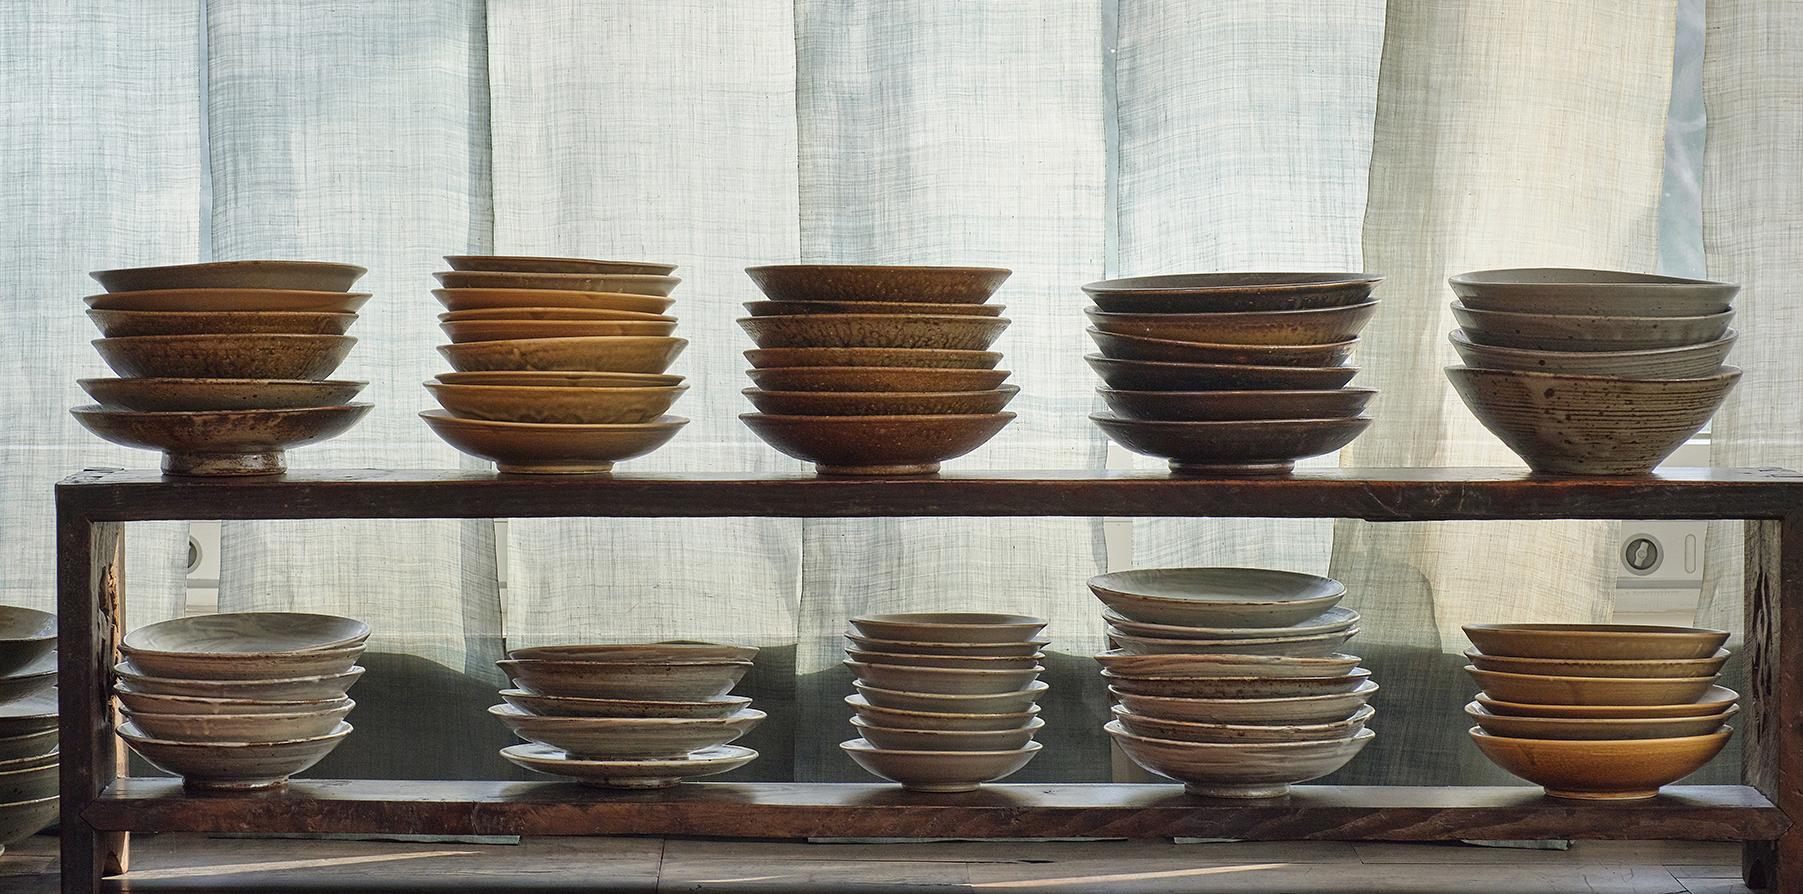 Monthly Korea Korean Pottery Profile Korea Net The Official Website Of The Republic Of Korea